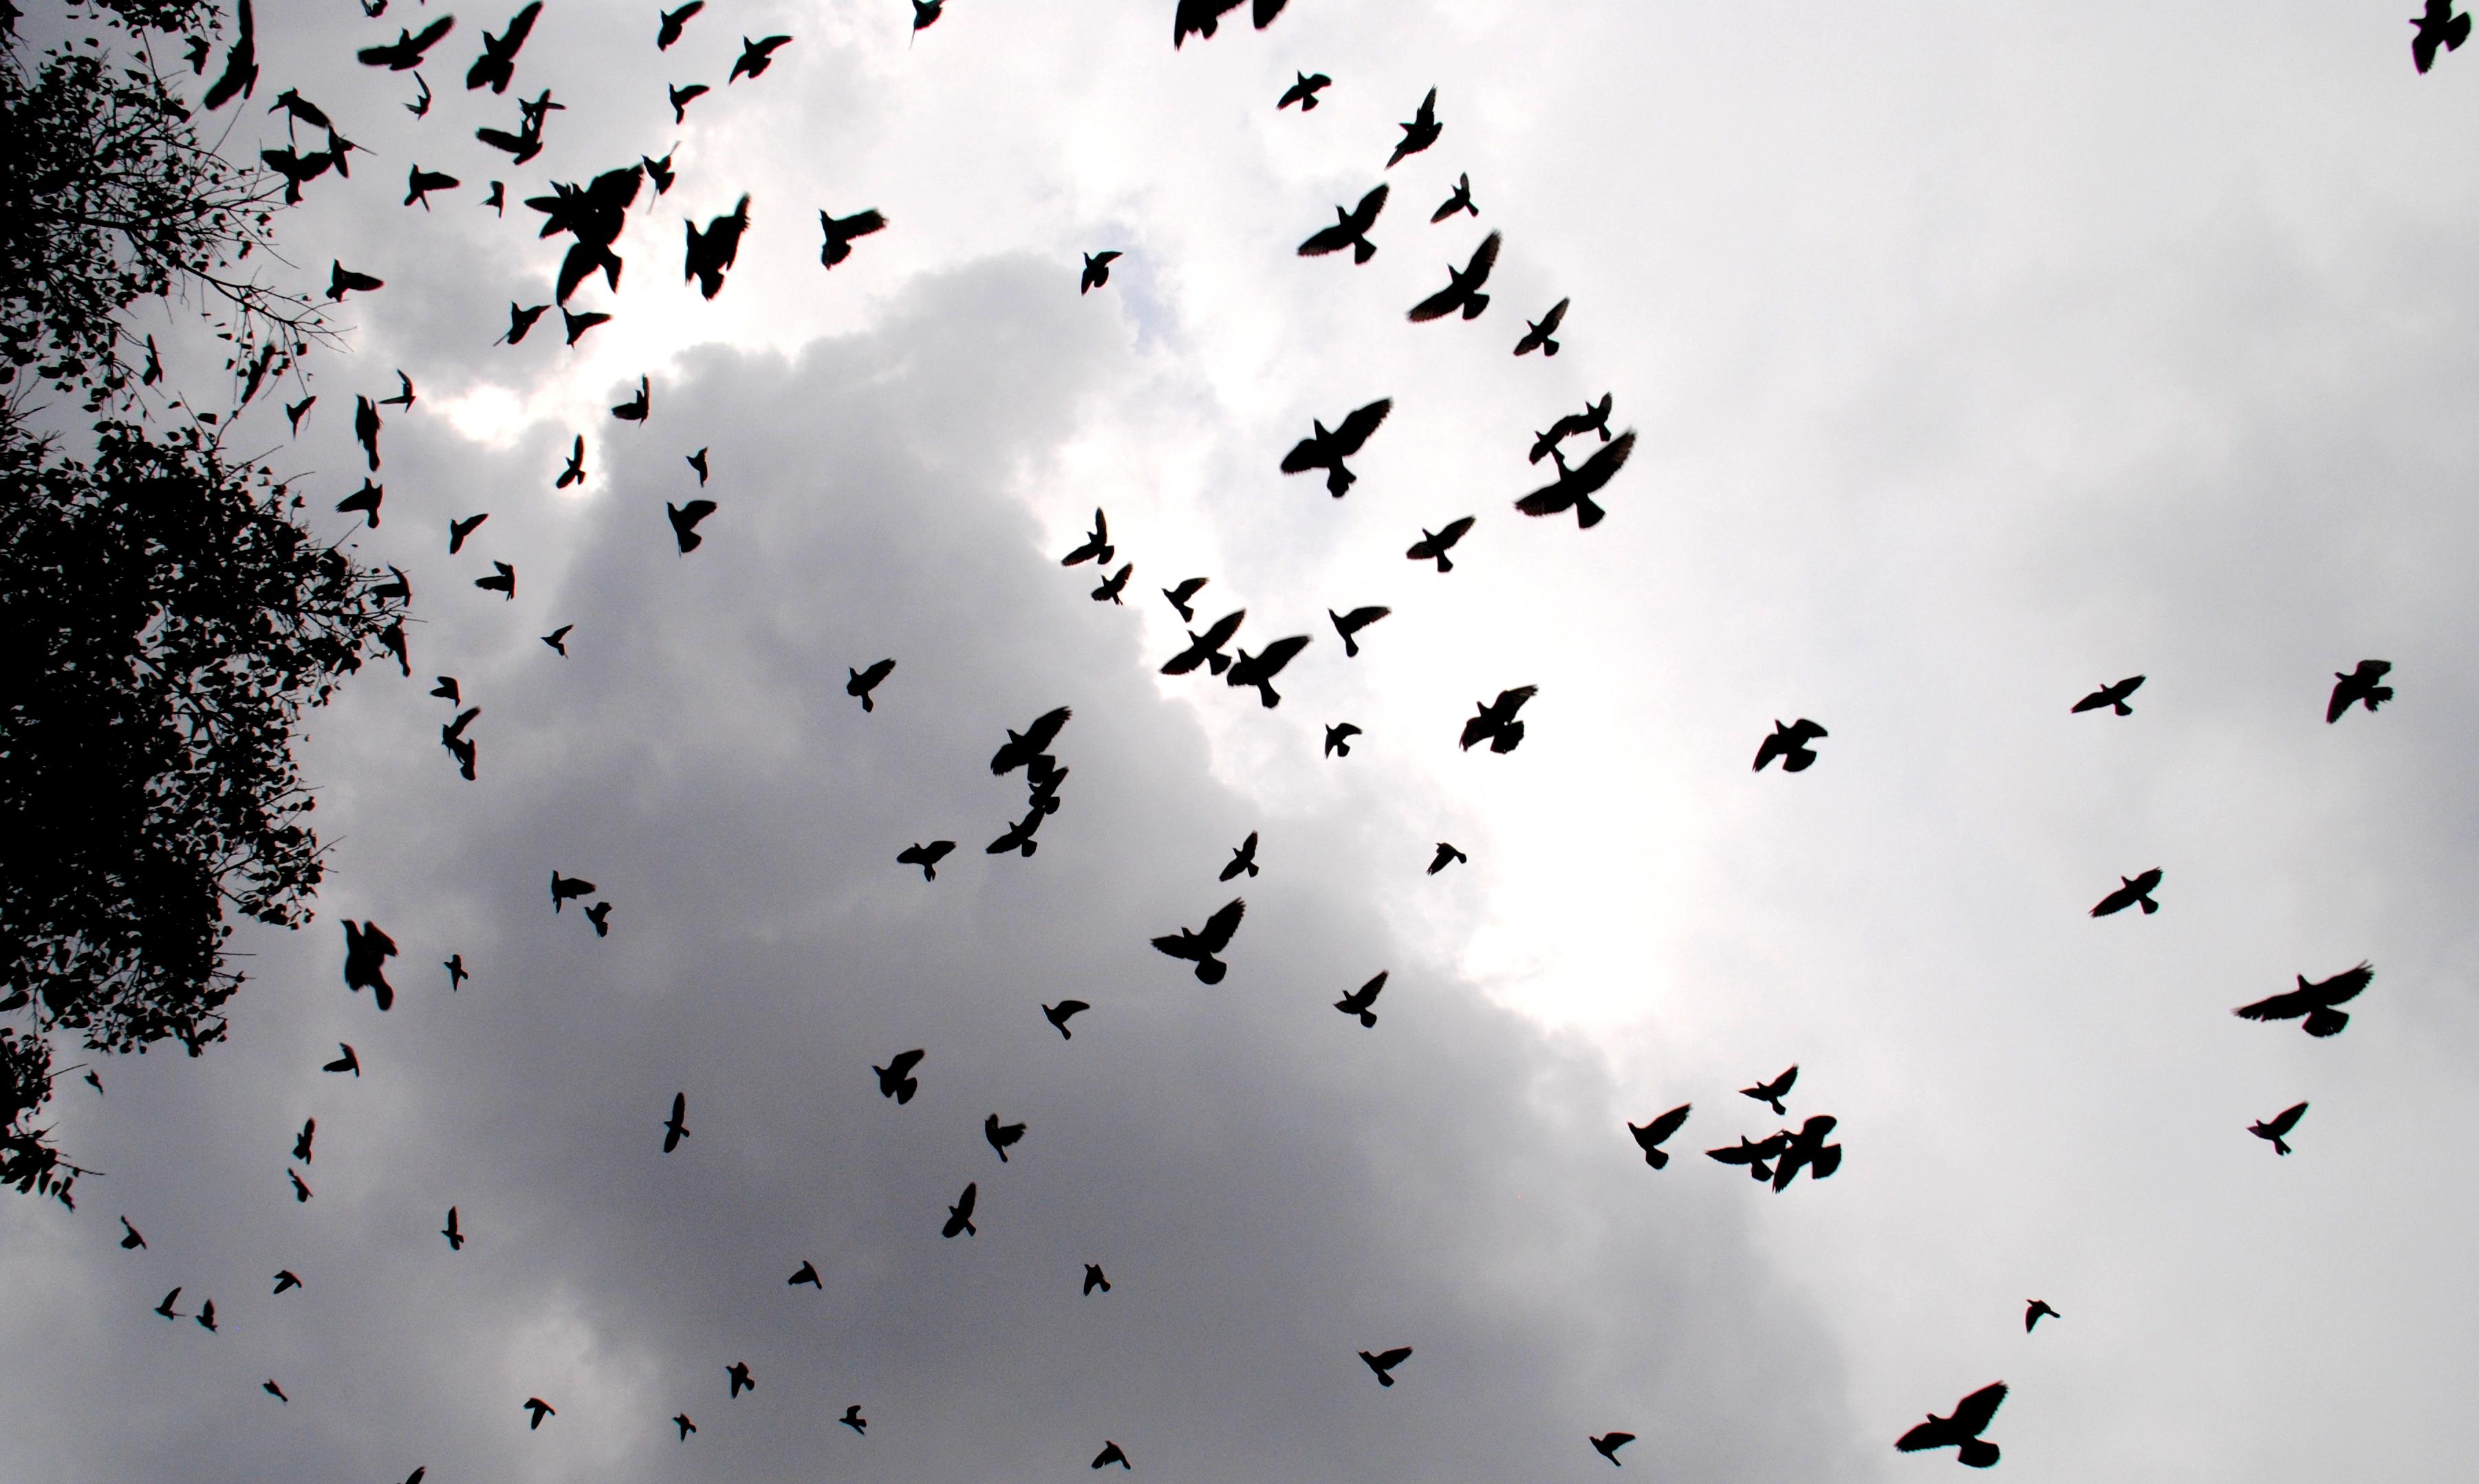 Birds flying in the sky - photo#28